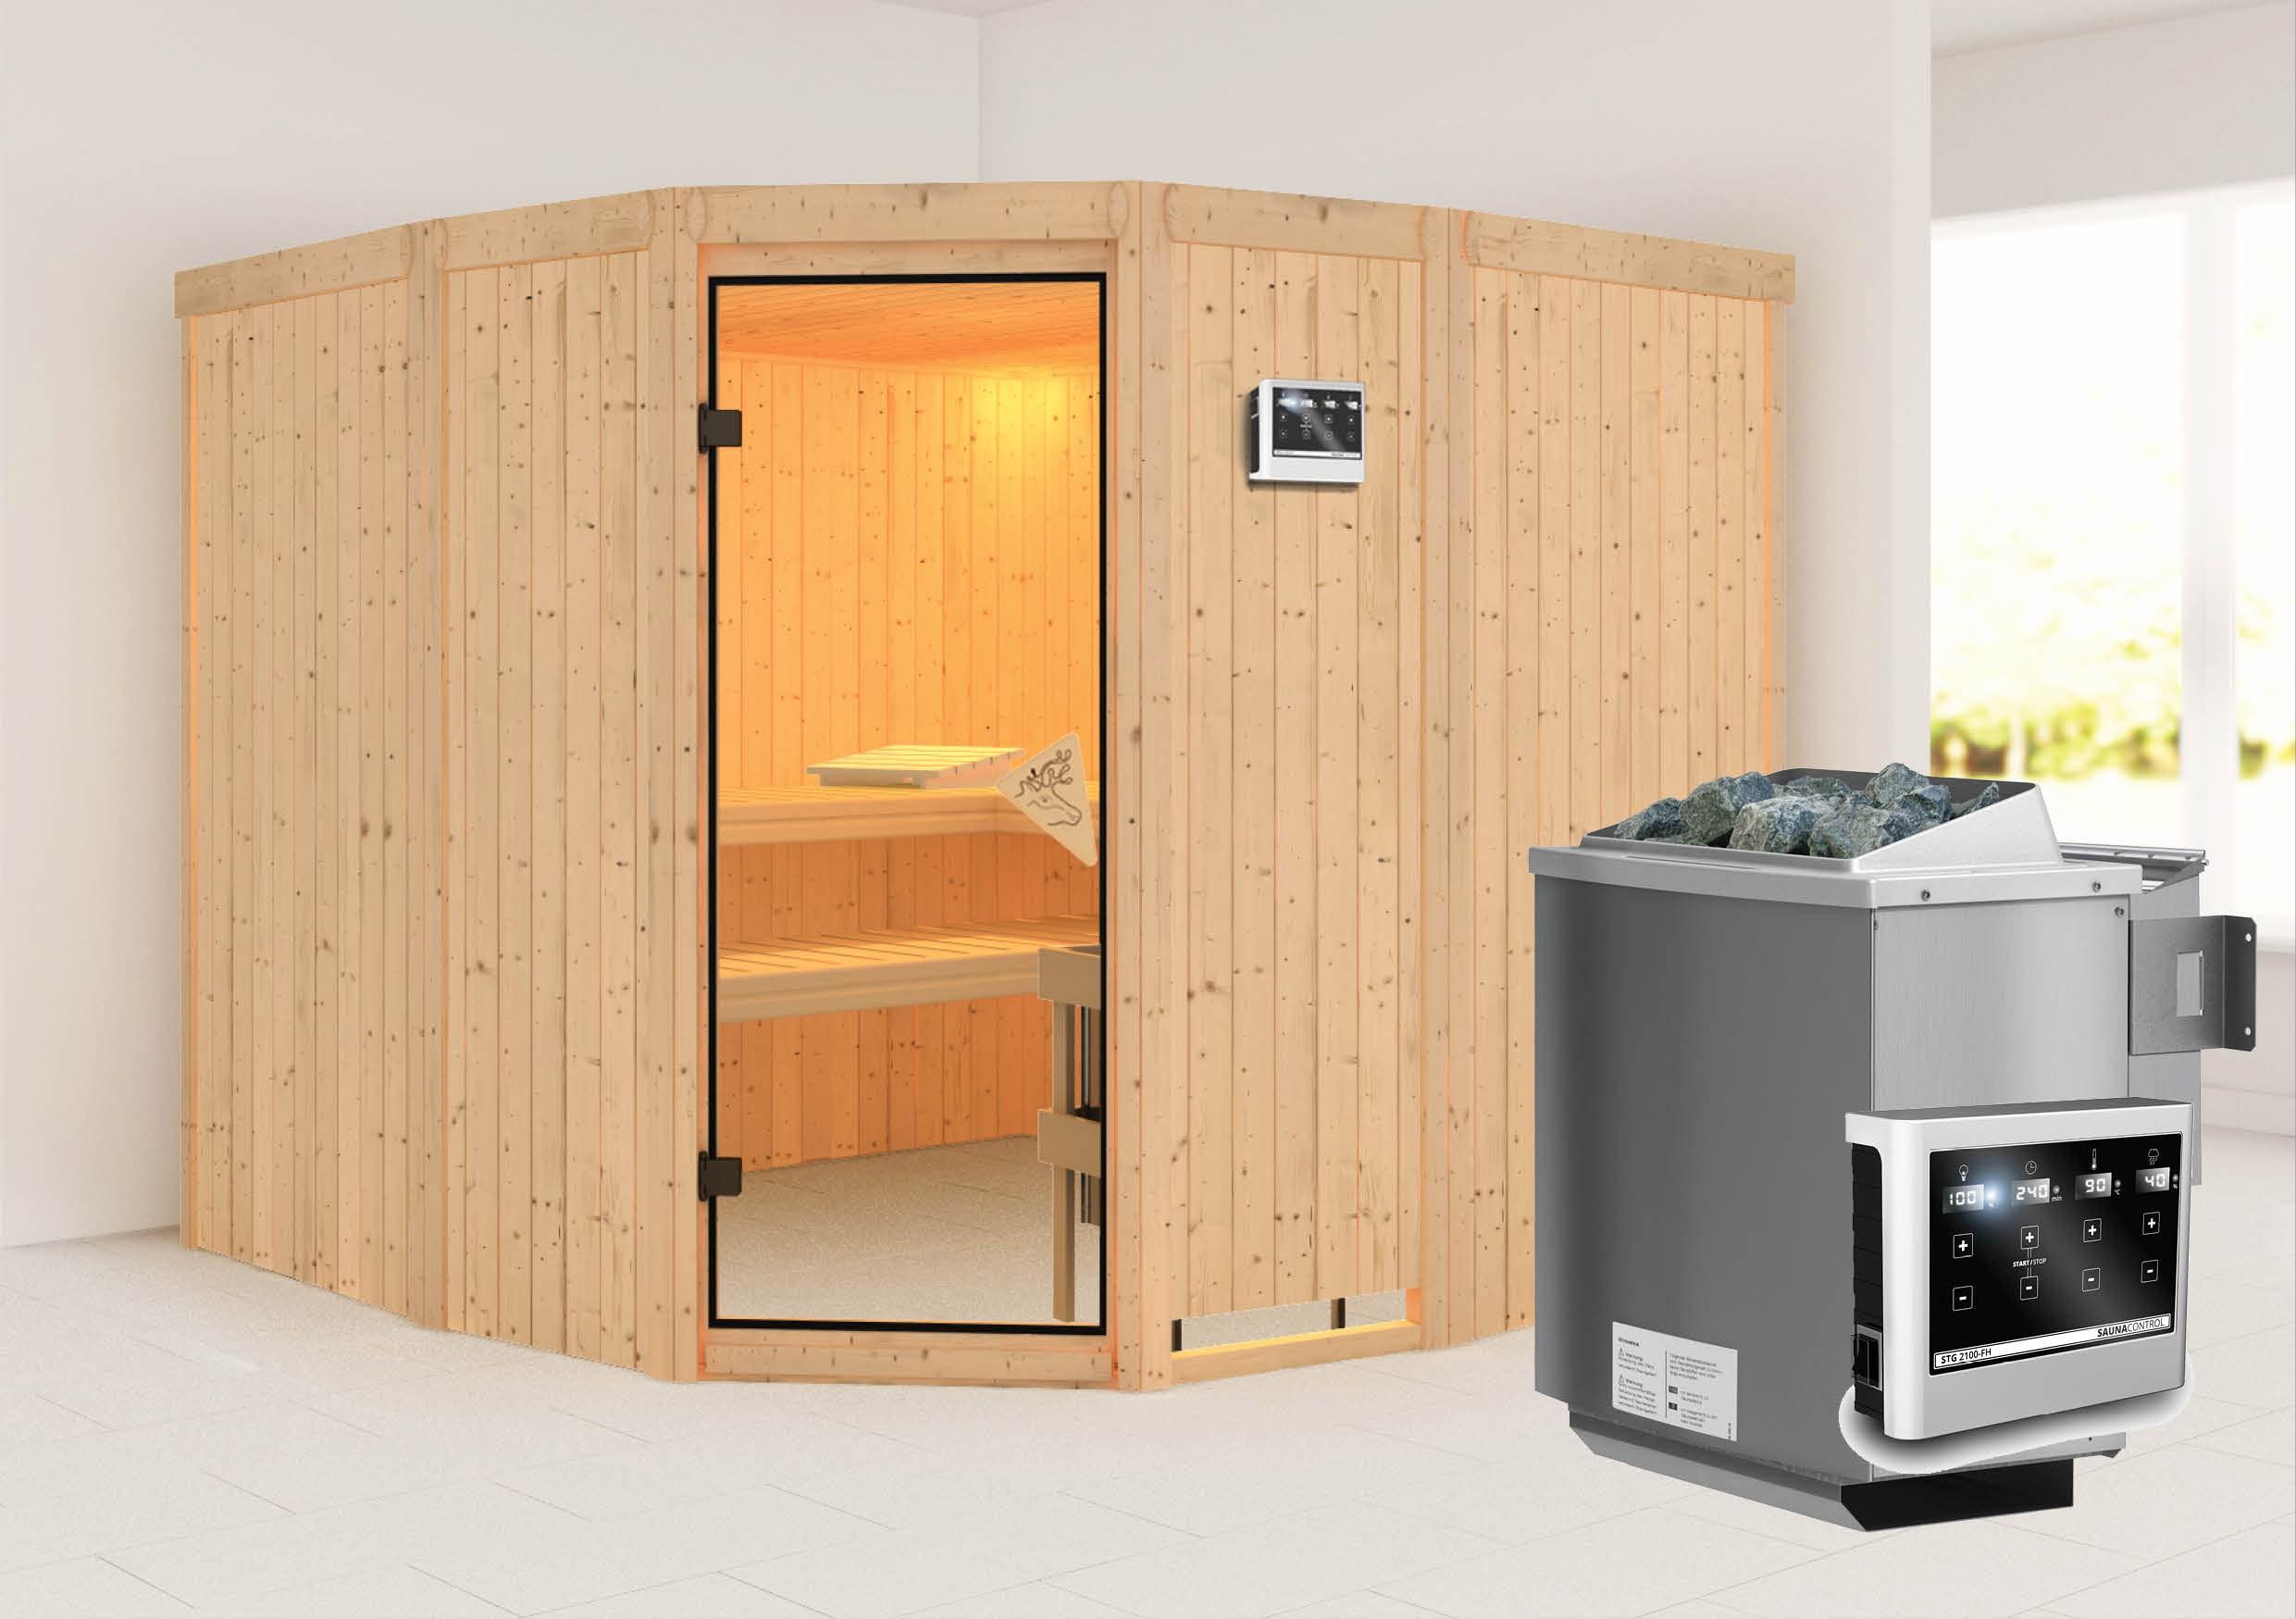 Karibu Sauna Simara3 68mm mit Bio Ofen 9kW extern classic Tür Bild 1